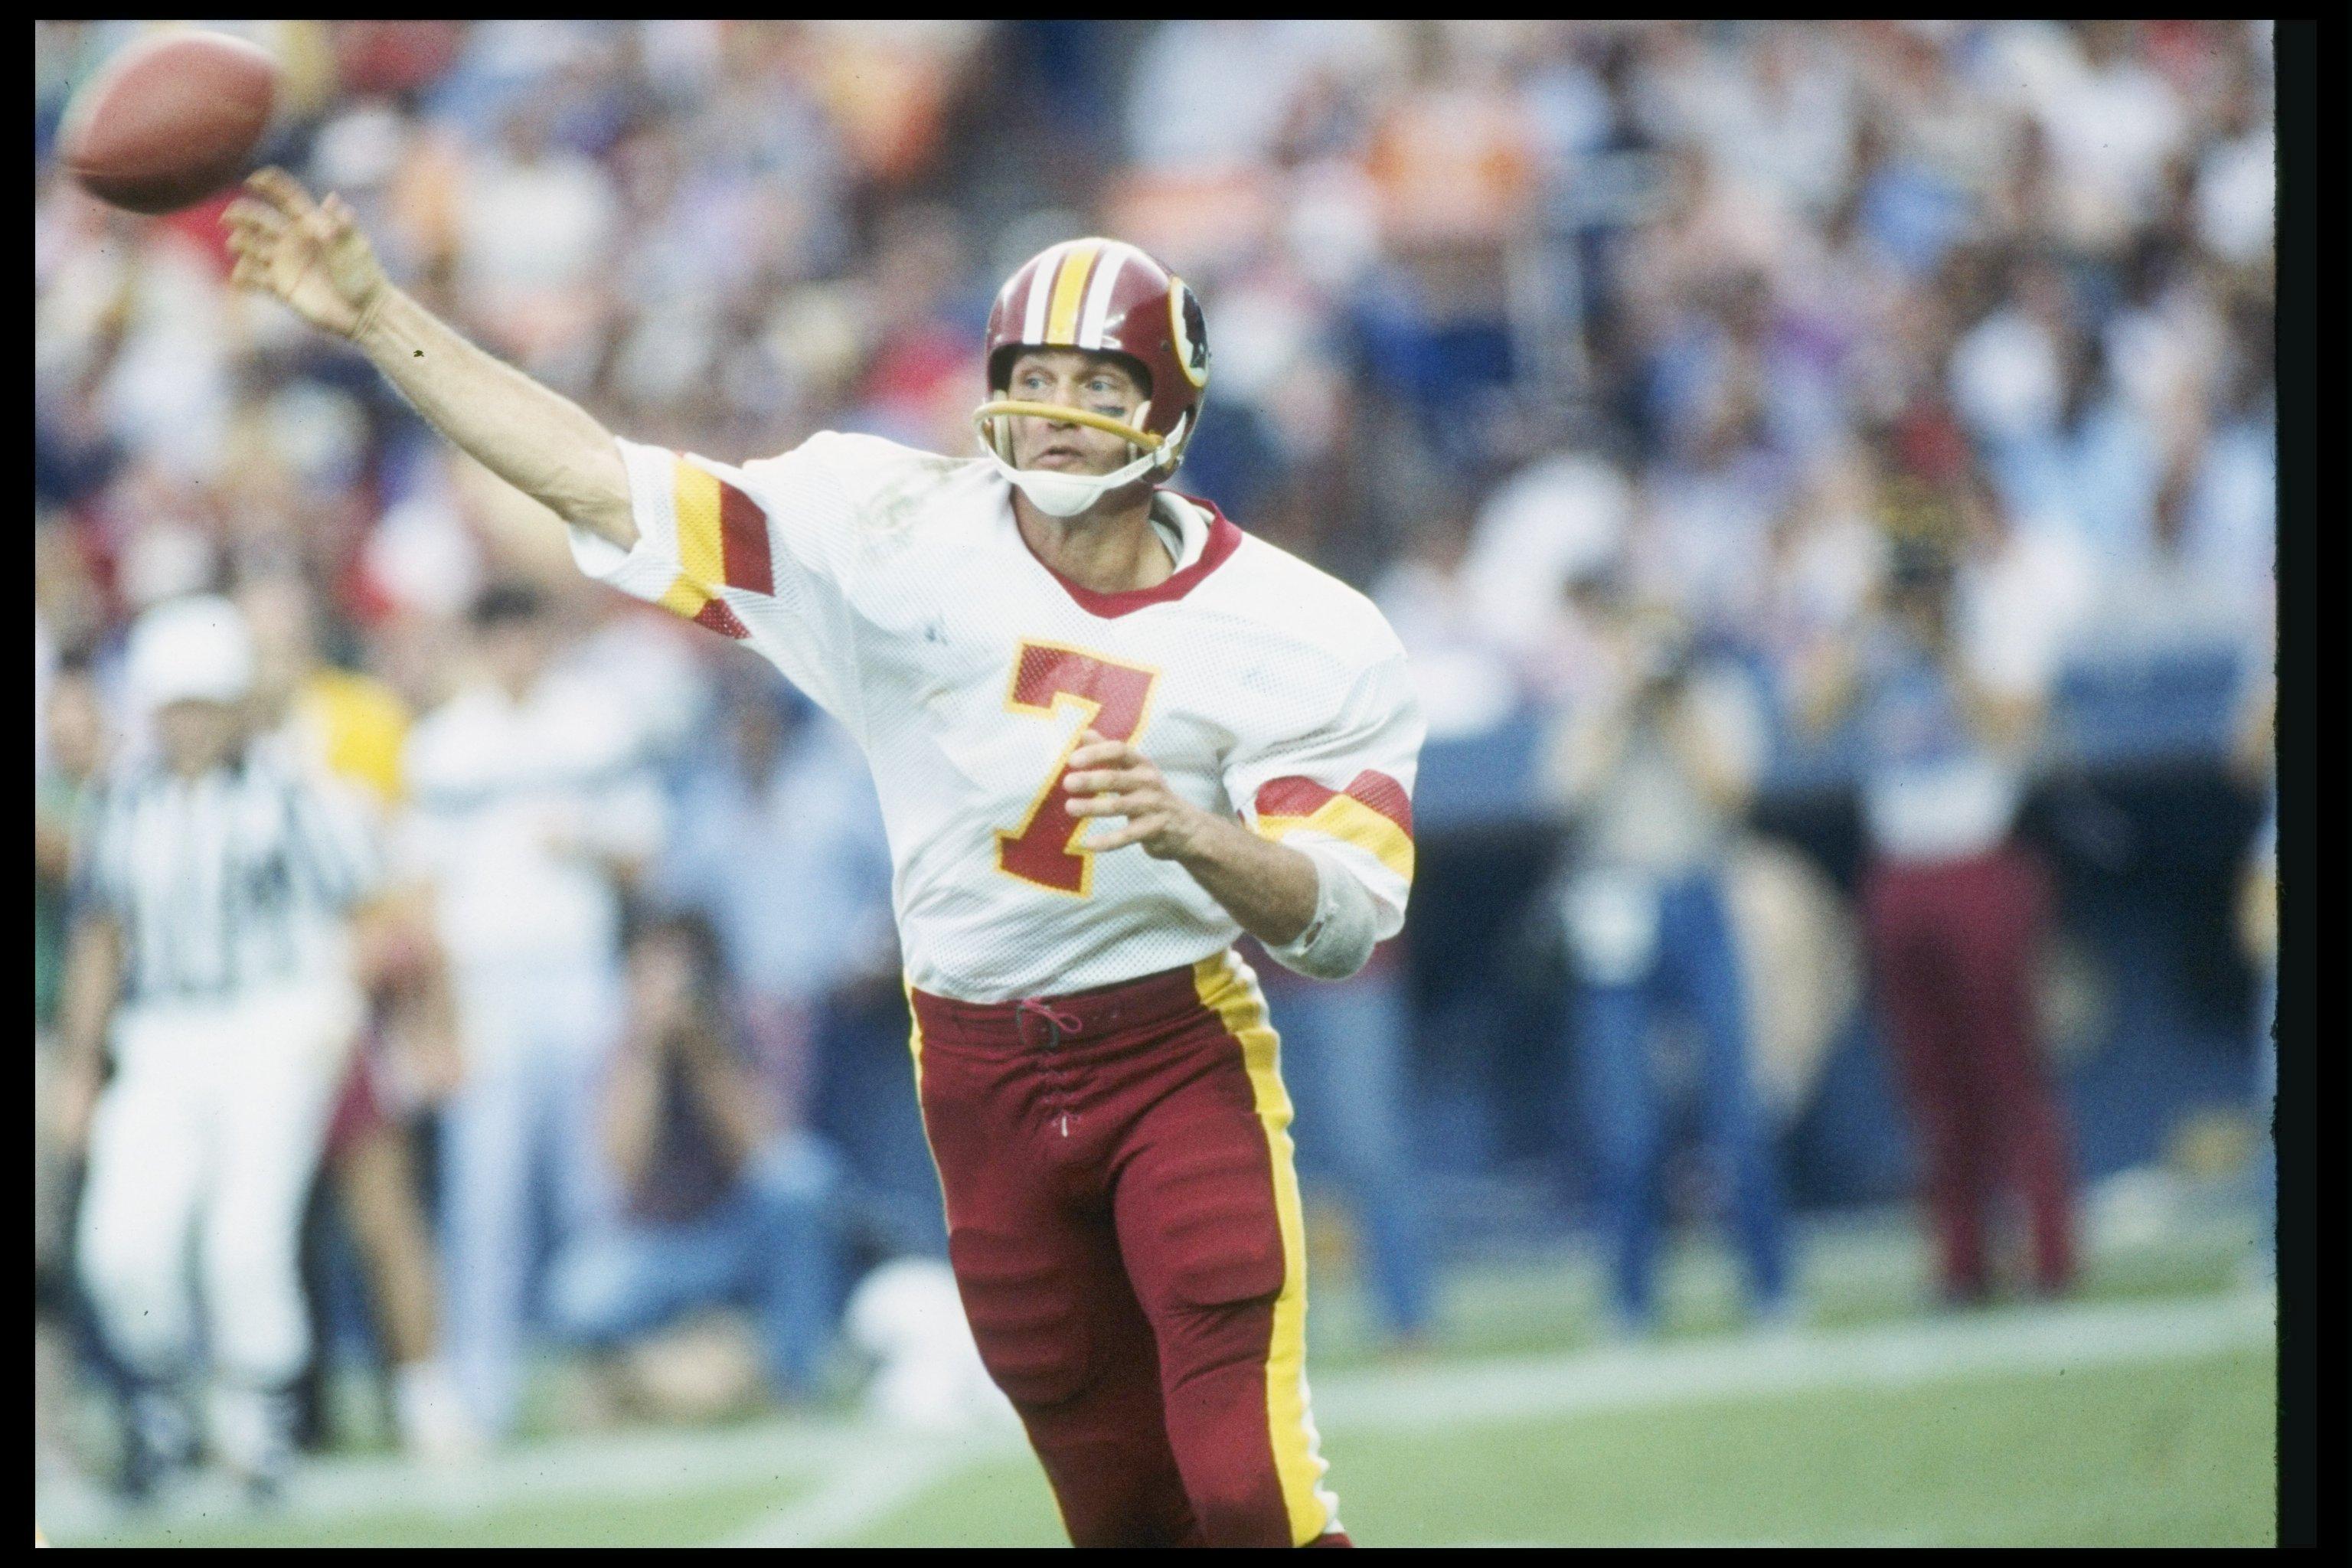 1983:  Quarterback Joe Theismann of the Washington Redskins passes the ball during a game. Mandatory Credit: Allsport  /Allsport